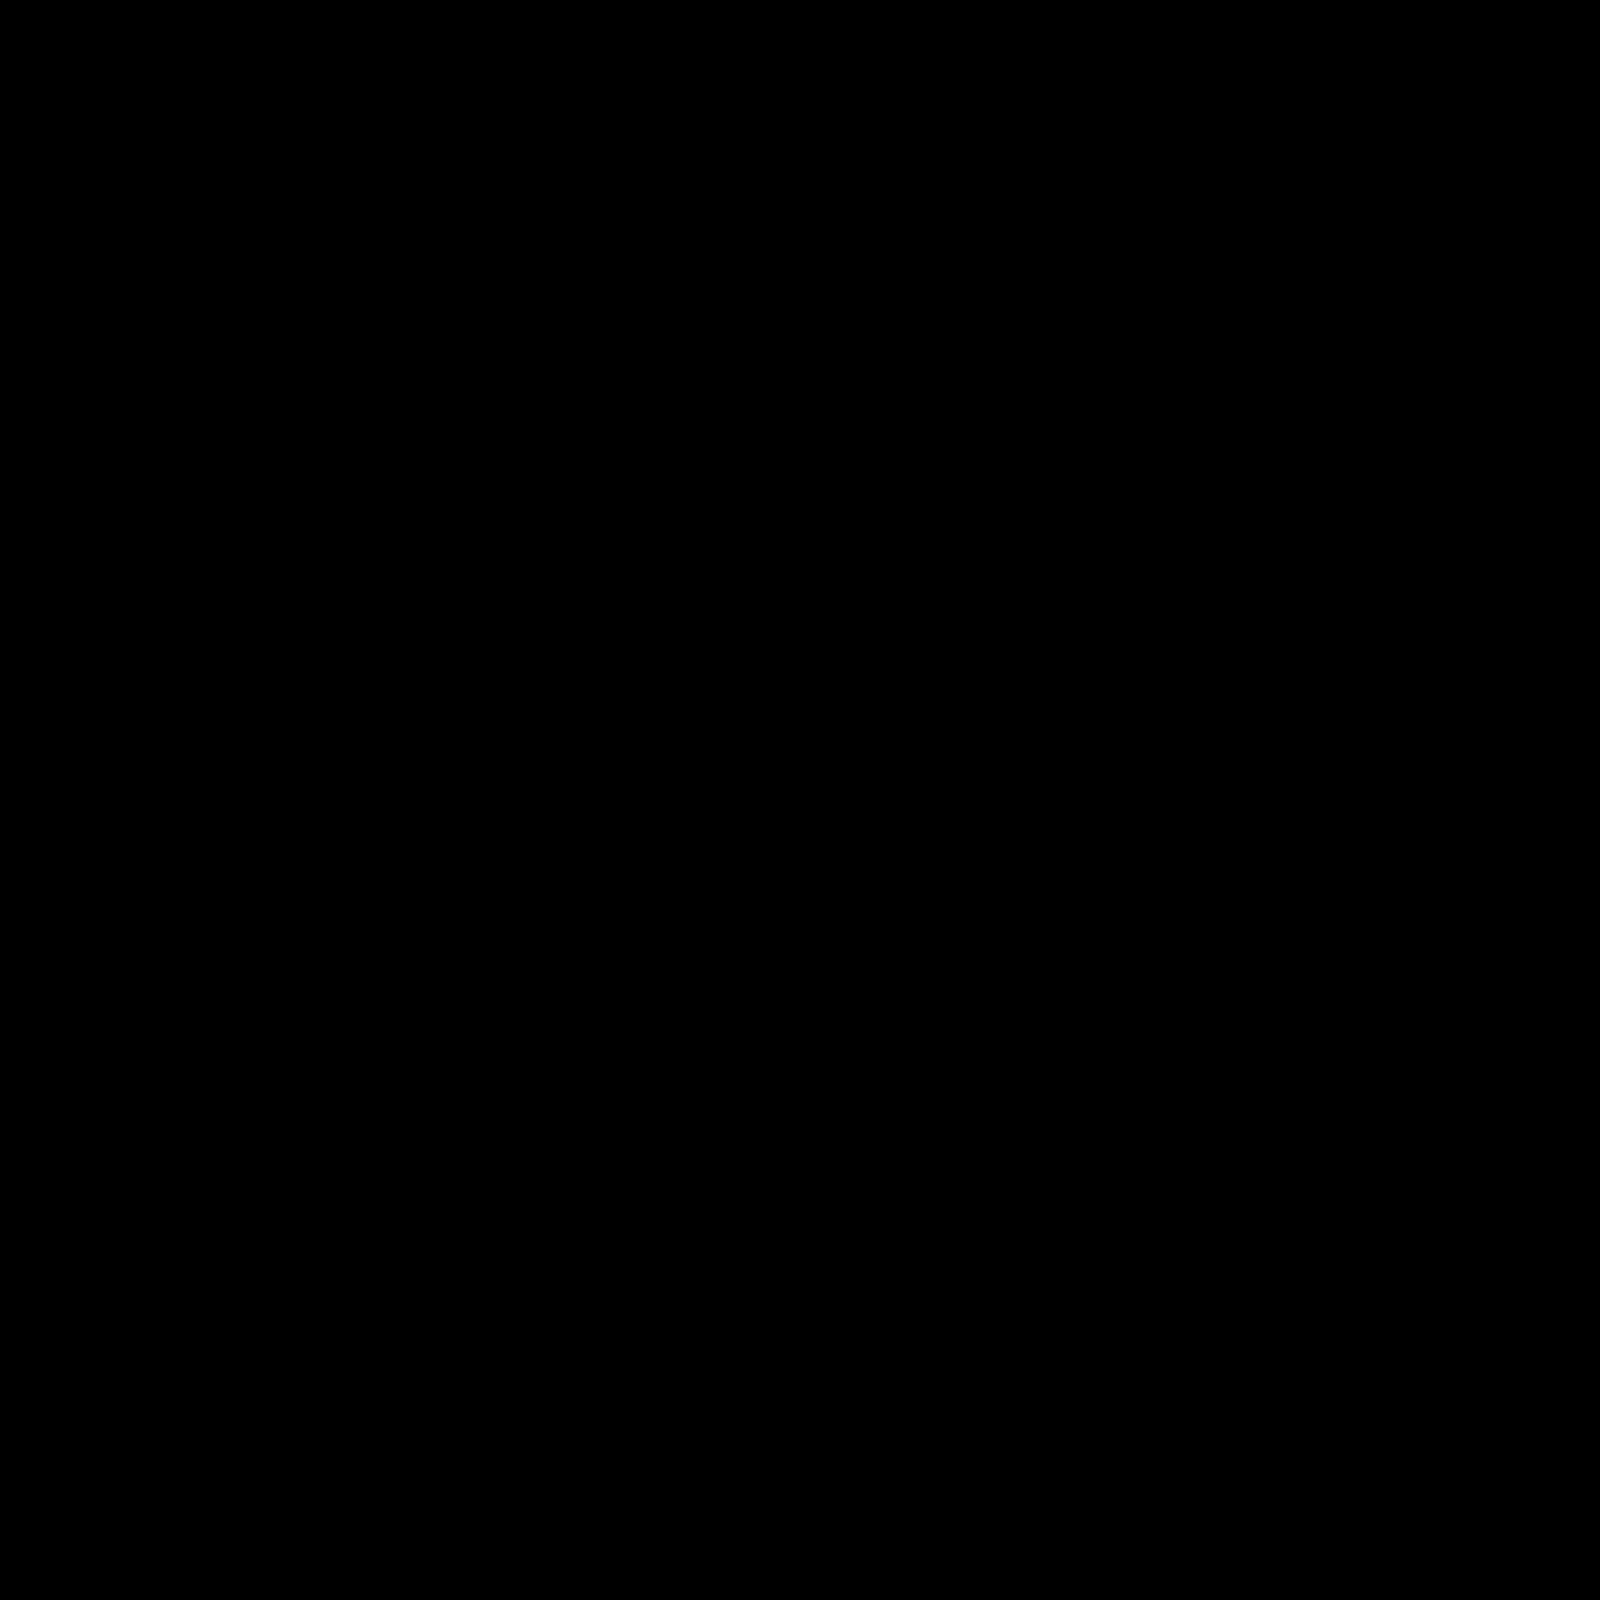 Pin By Antasia On Iphone Inspo Snapchat Logo Iphone Icon Snapchat